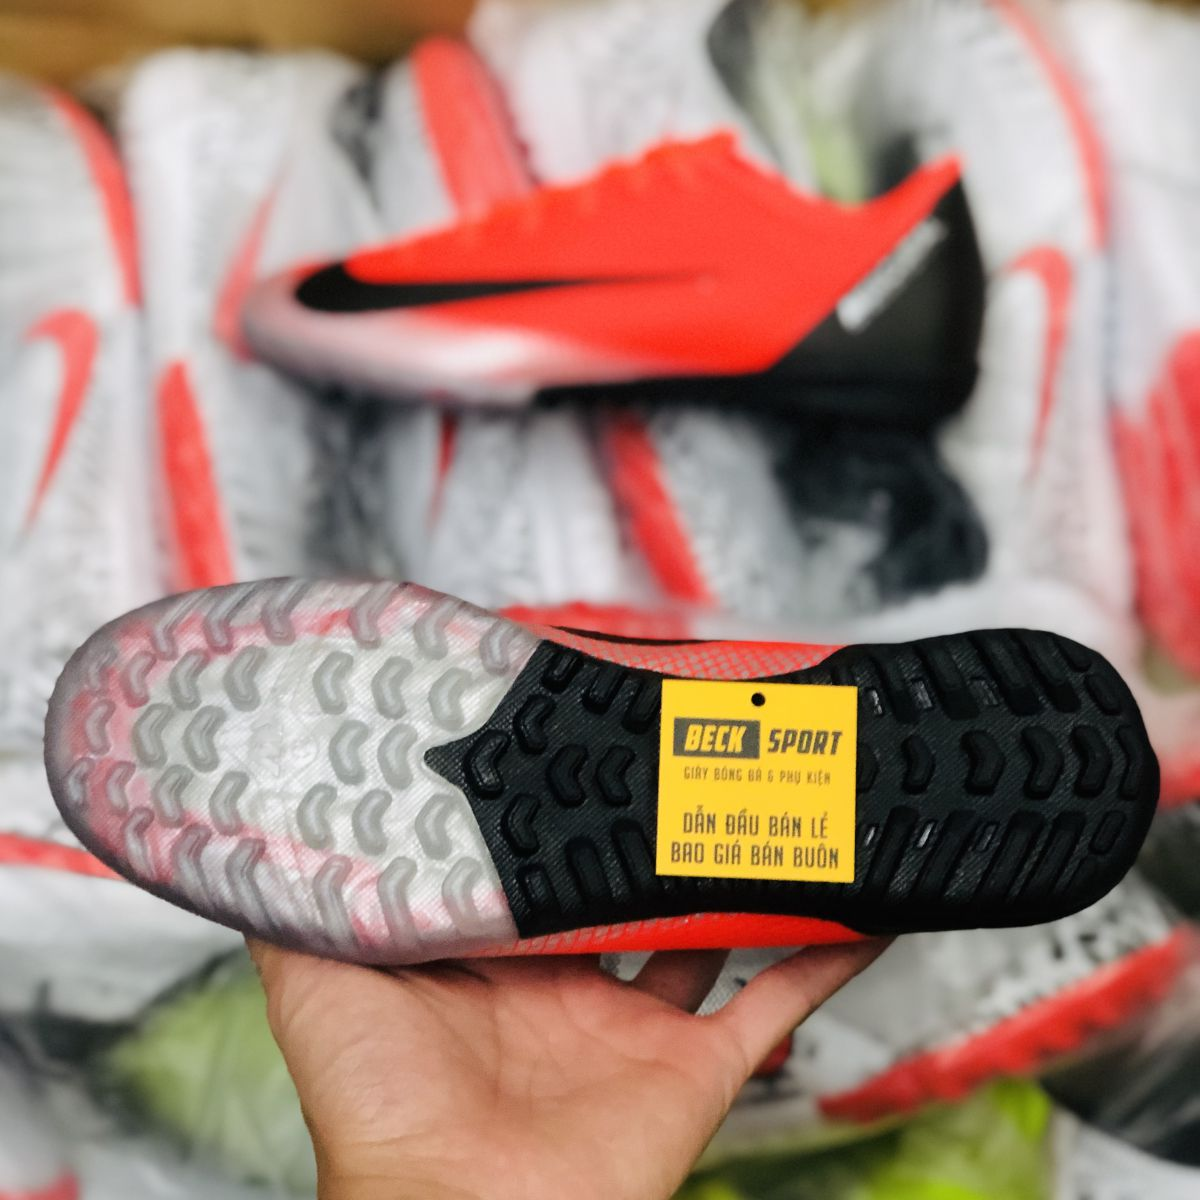 Giày Bóng Đá Nike Mercurial Vapor 6 Academy CR7 Cam Đỏ Gót Đen TF